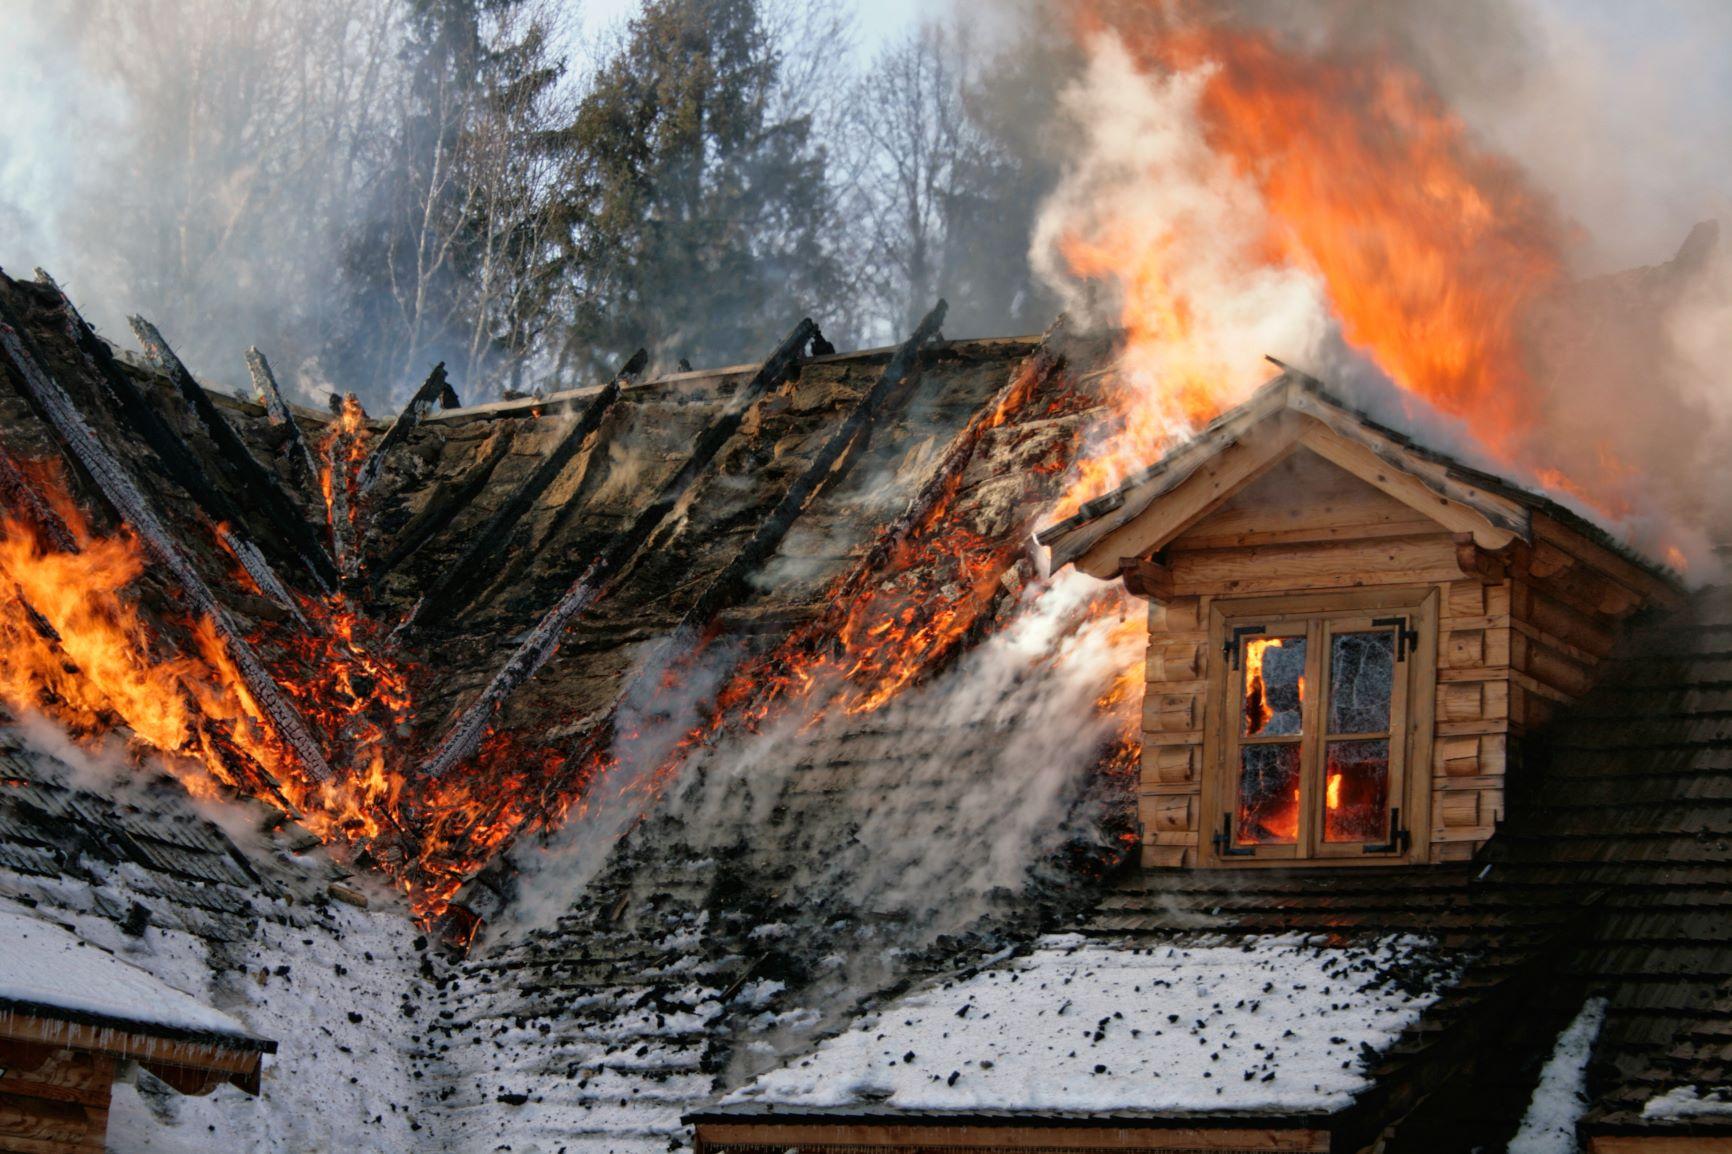 zhorená strecha domu